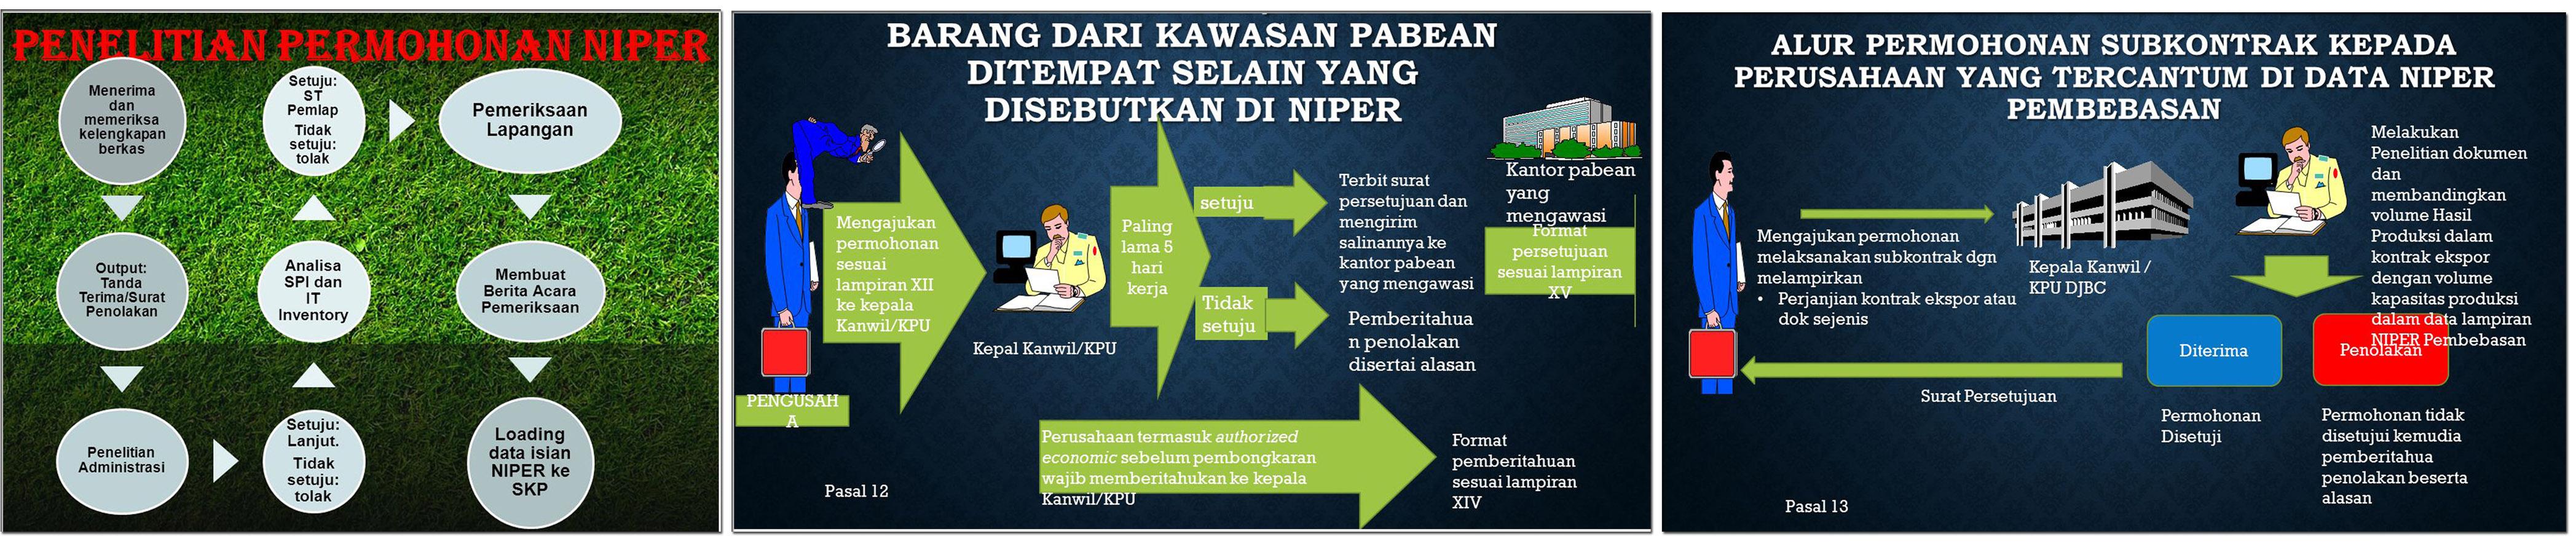 http://www.perizinanindonesia.com/upload/Pendaftaran%20Niper.jpg